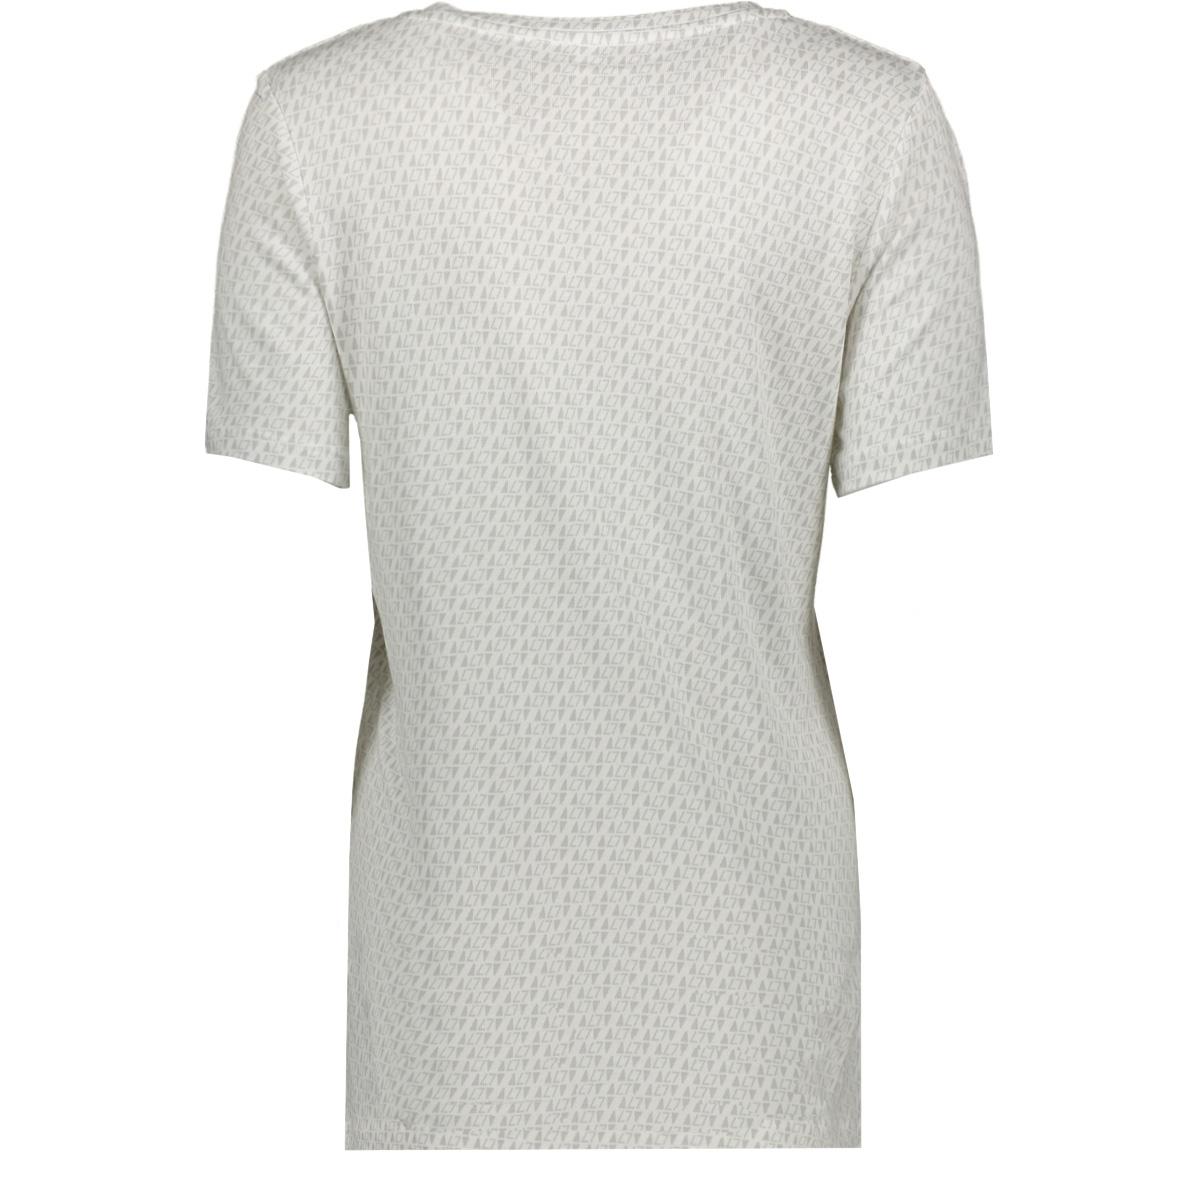 marvel printed t shirt 202 zoso t-shirt white/kiezel